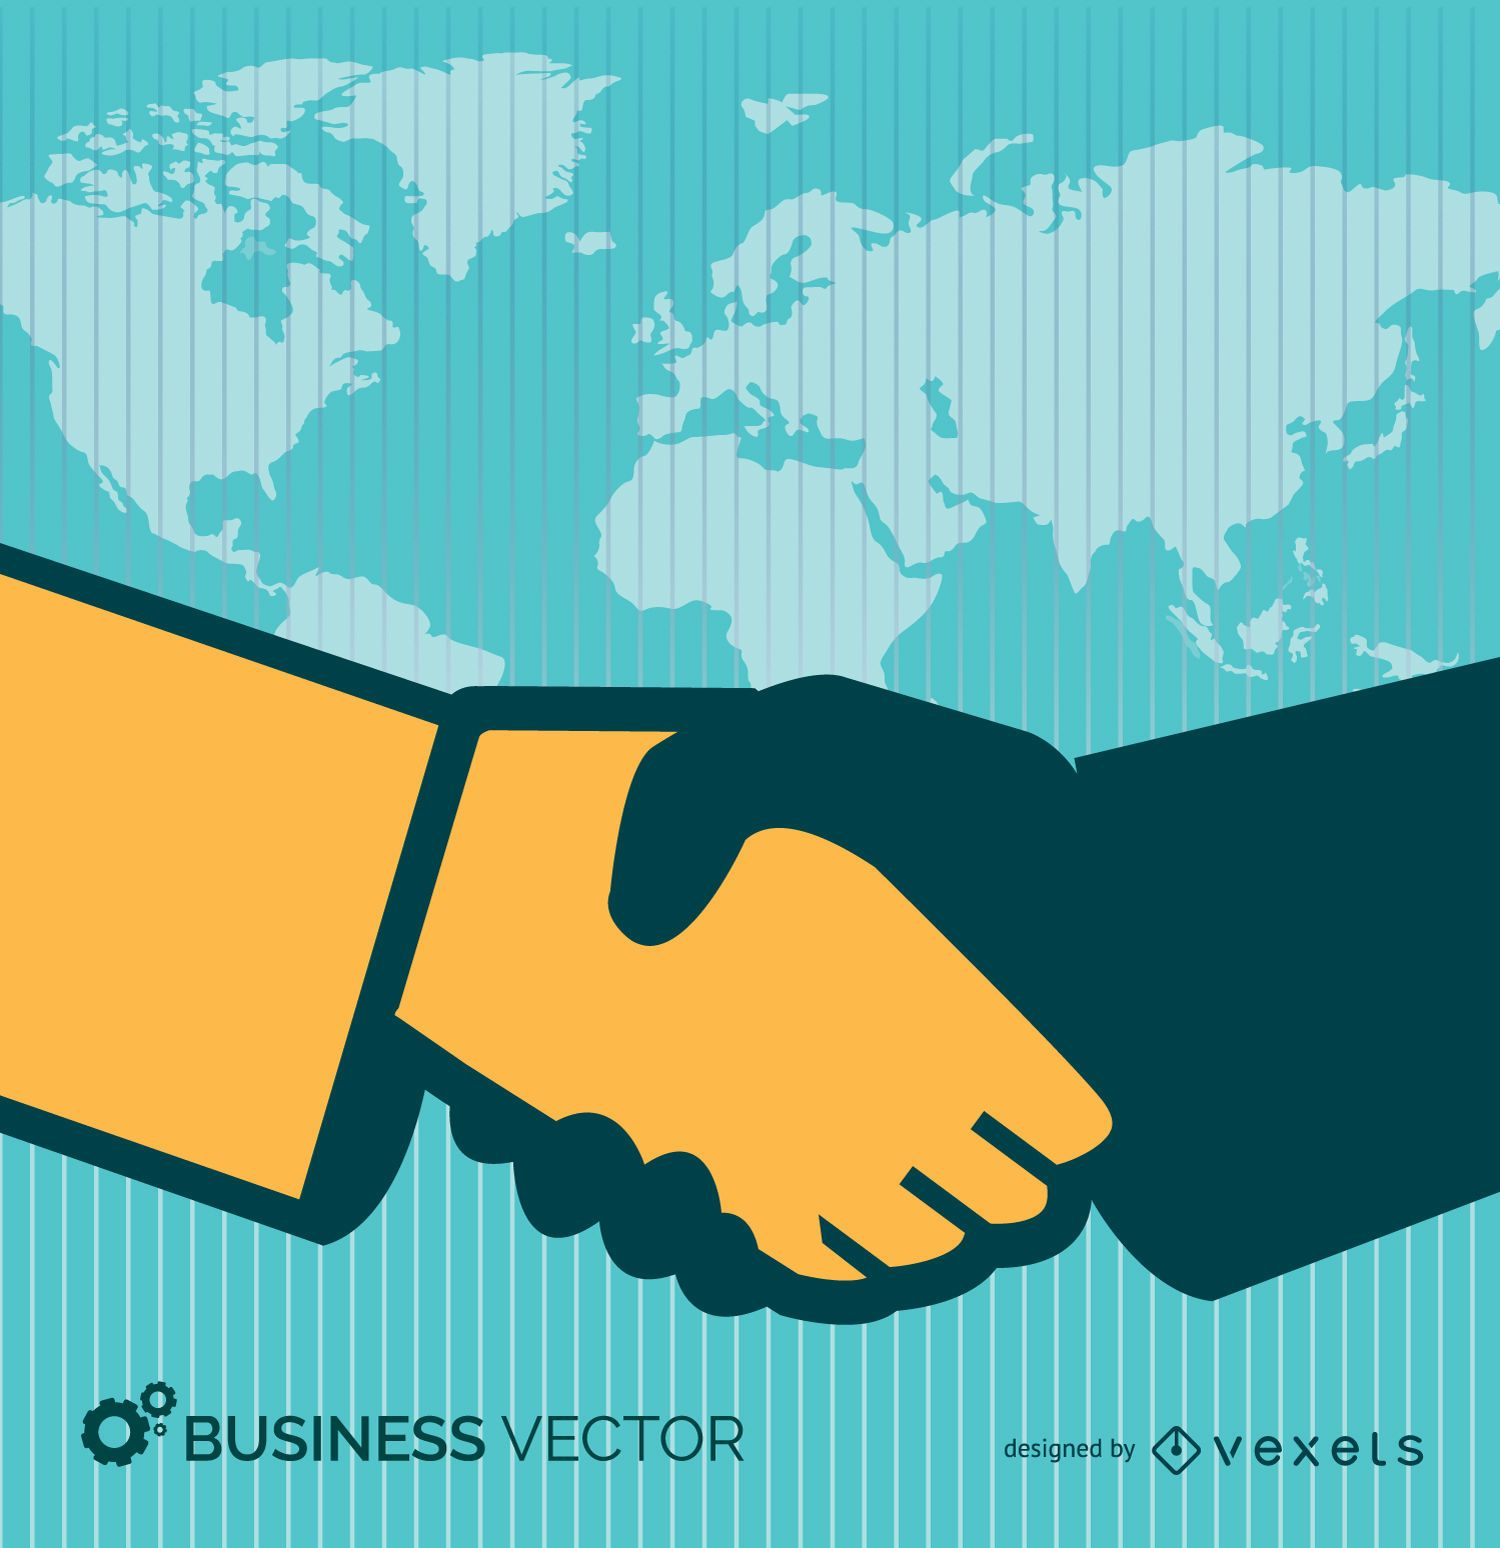 Apretón de manos de trato comercial